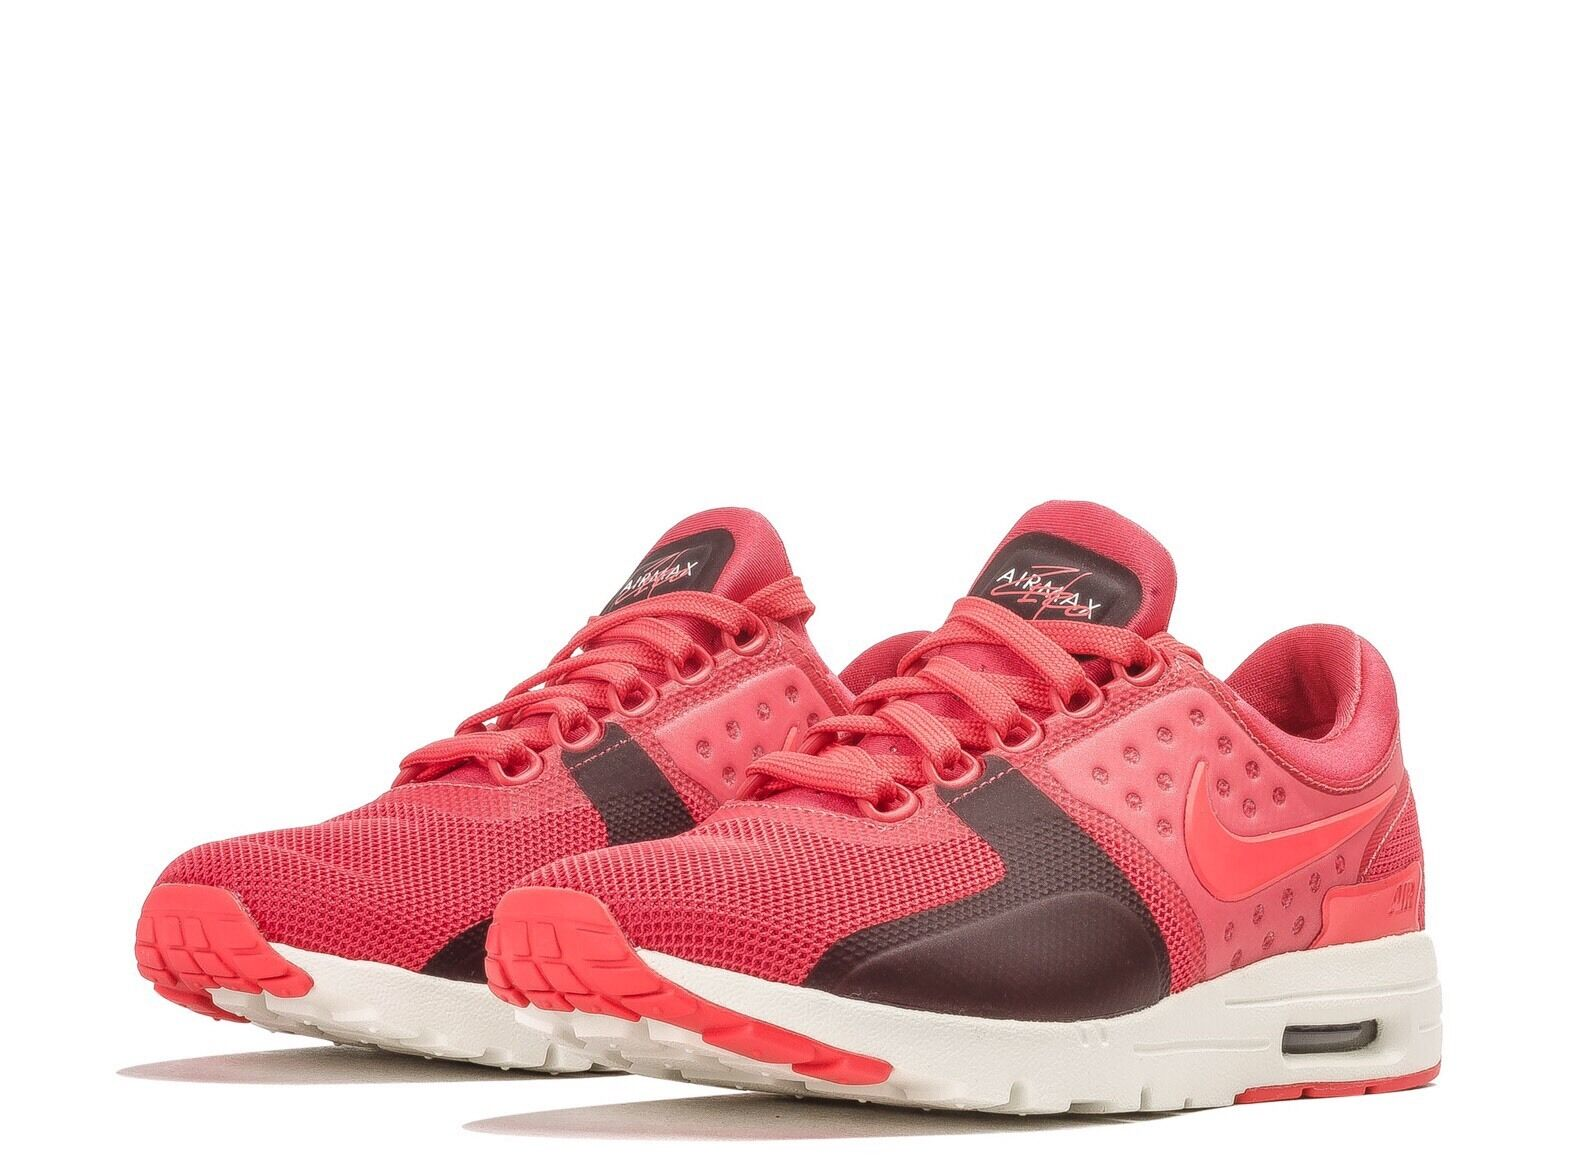 Para mujer Nike Air Max cero Ember resplandor UK Size 7.5 857661-800